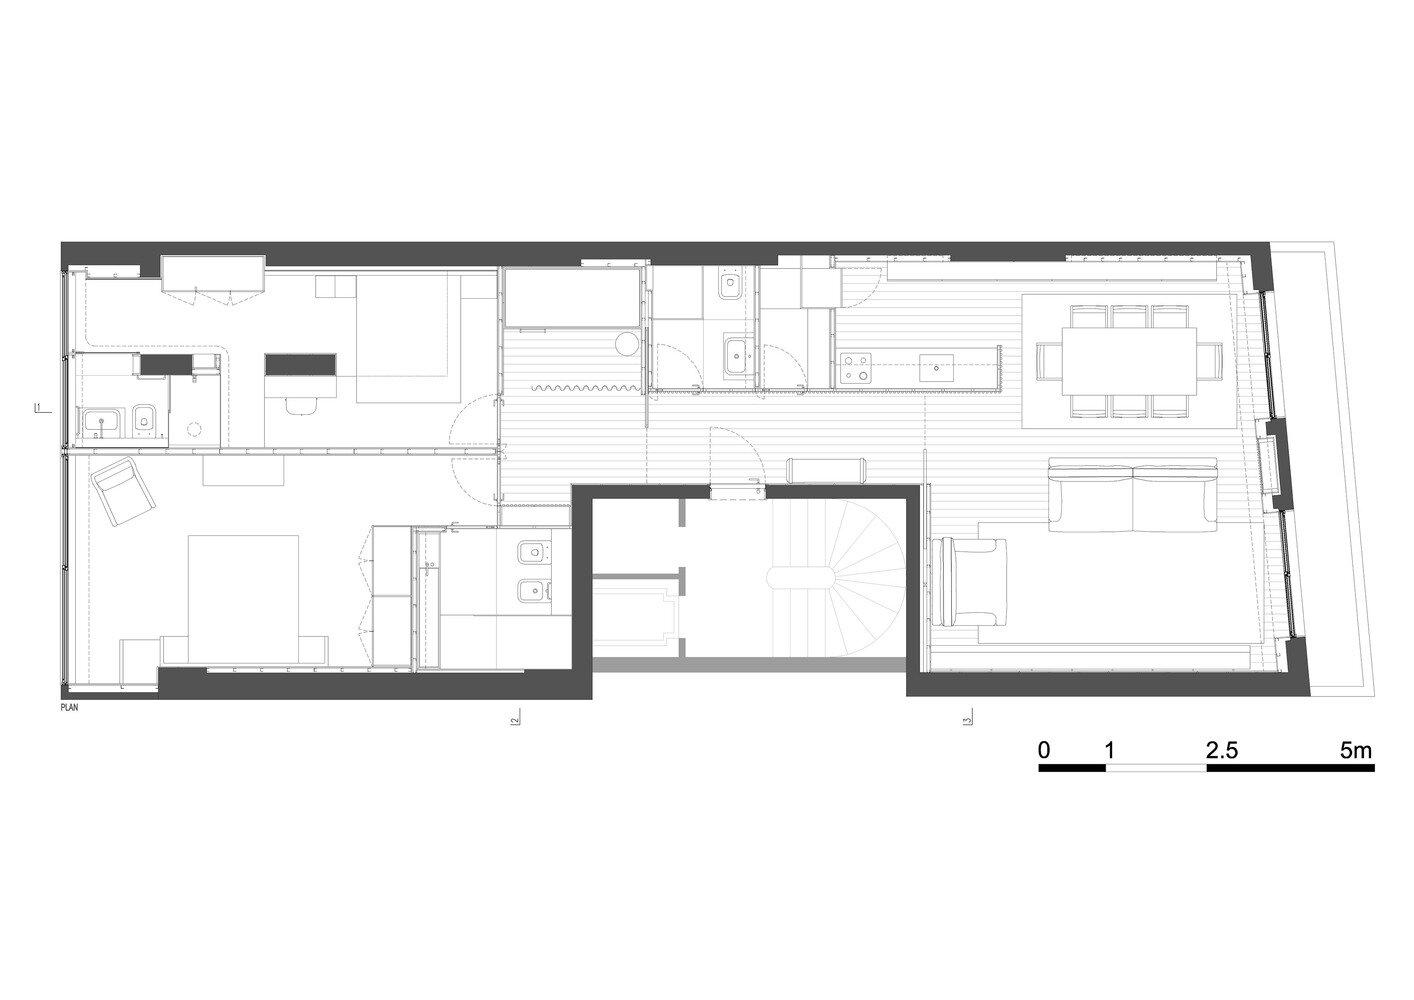 Apartment at Póvoa do Varzim - Pitagoras Group - Portugal - Floor Plan - Humble Homes